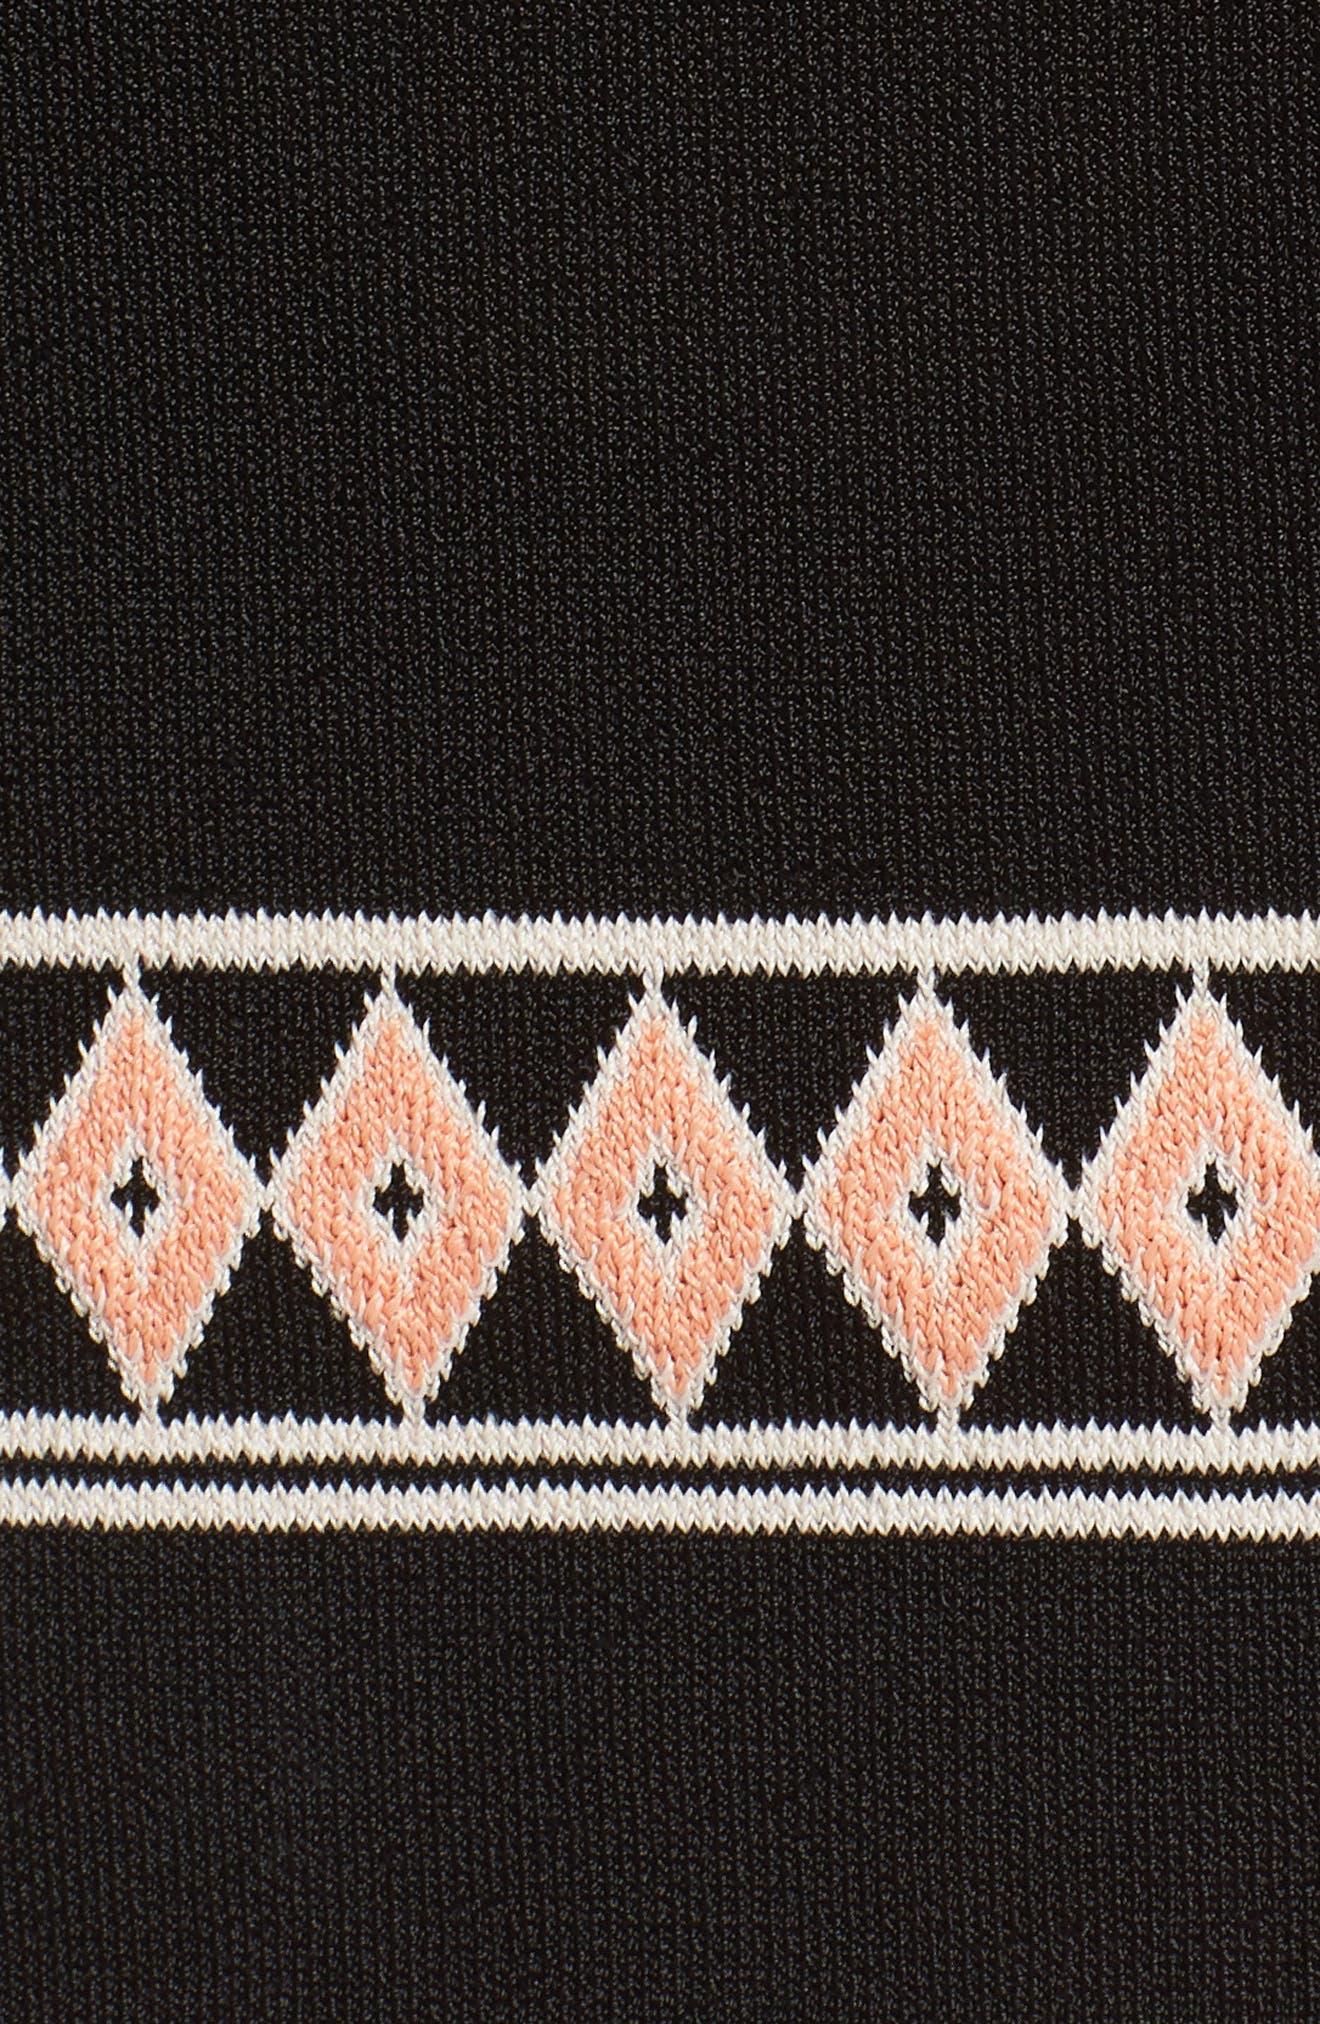 Body-Con Knit Dress,                             Alternate thumbnail 5, color,                             BLACK